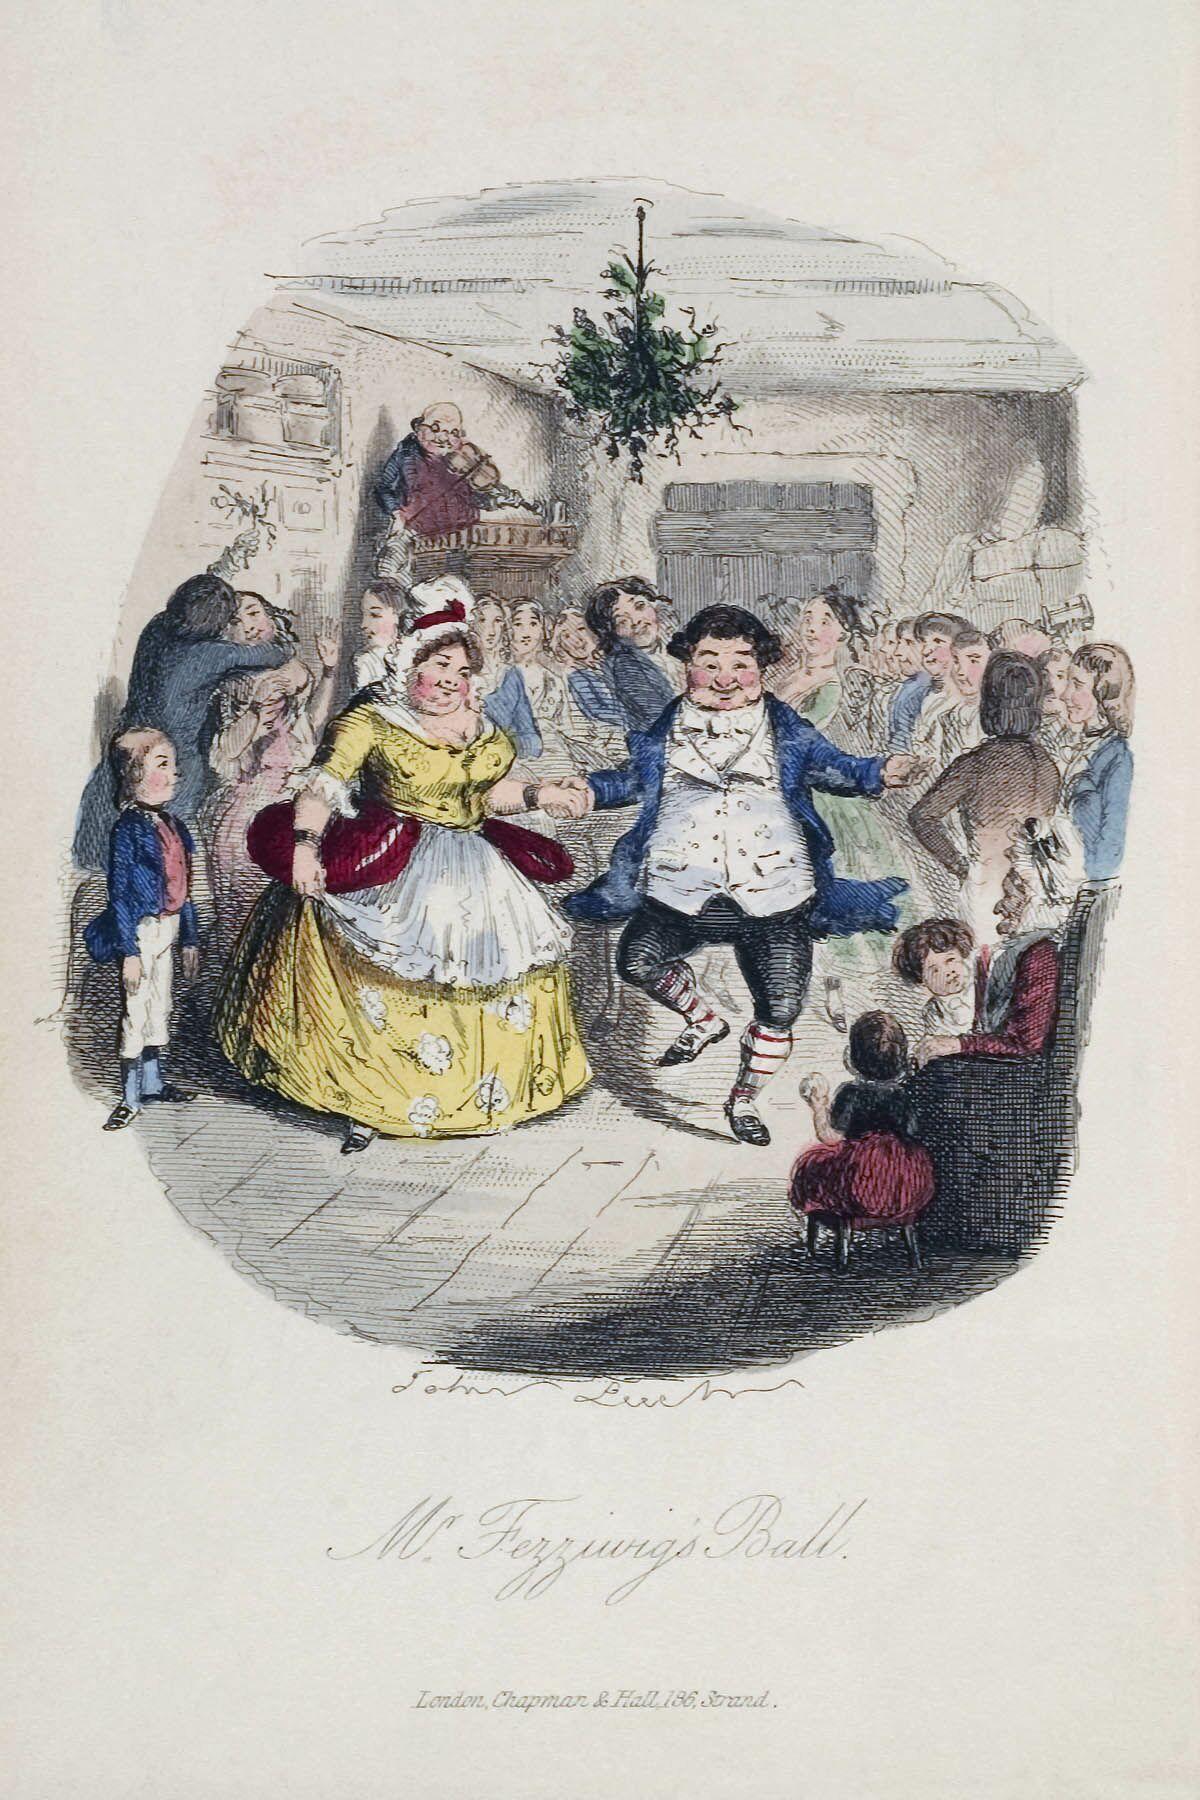 Fezziwig- 19th century